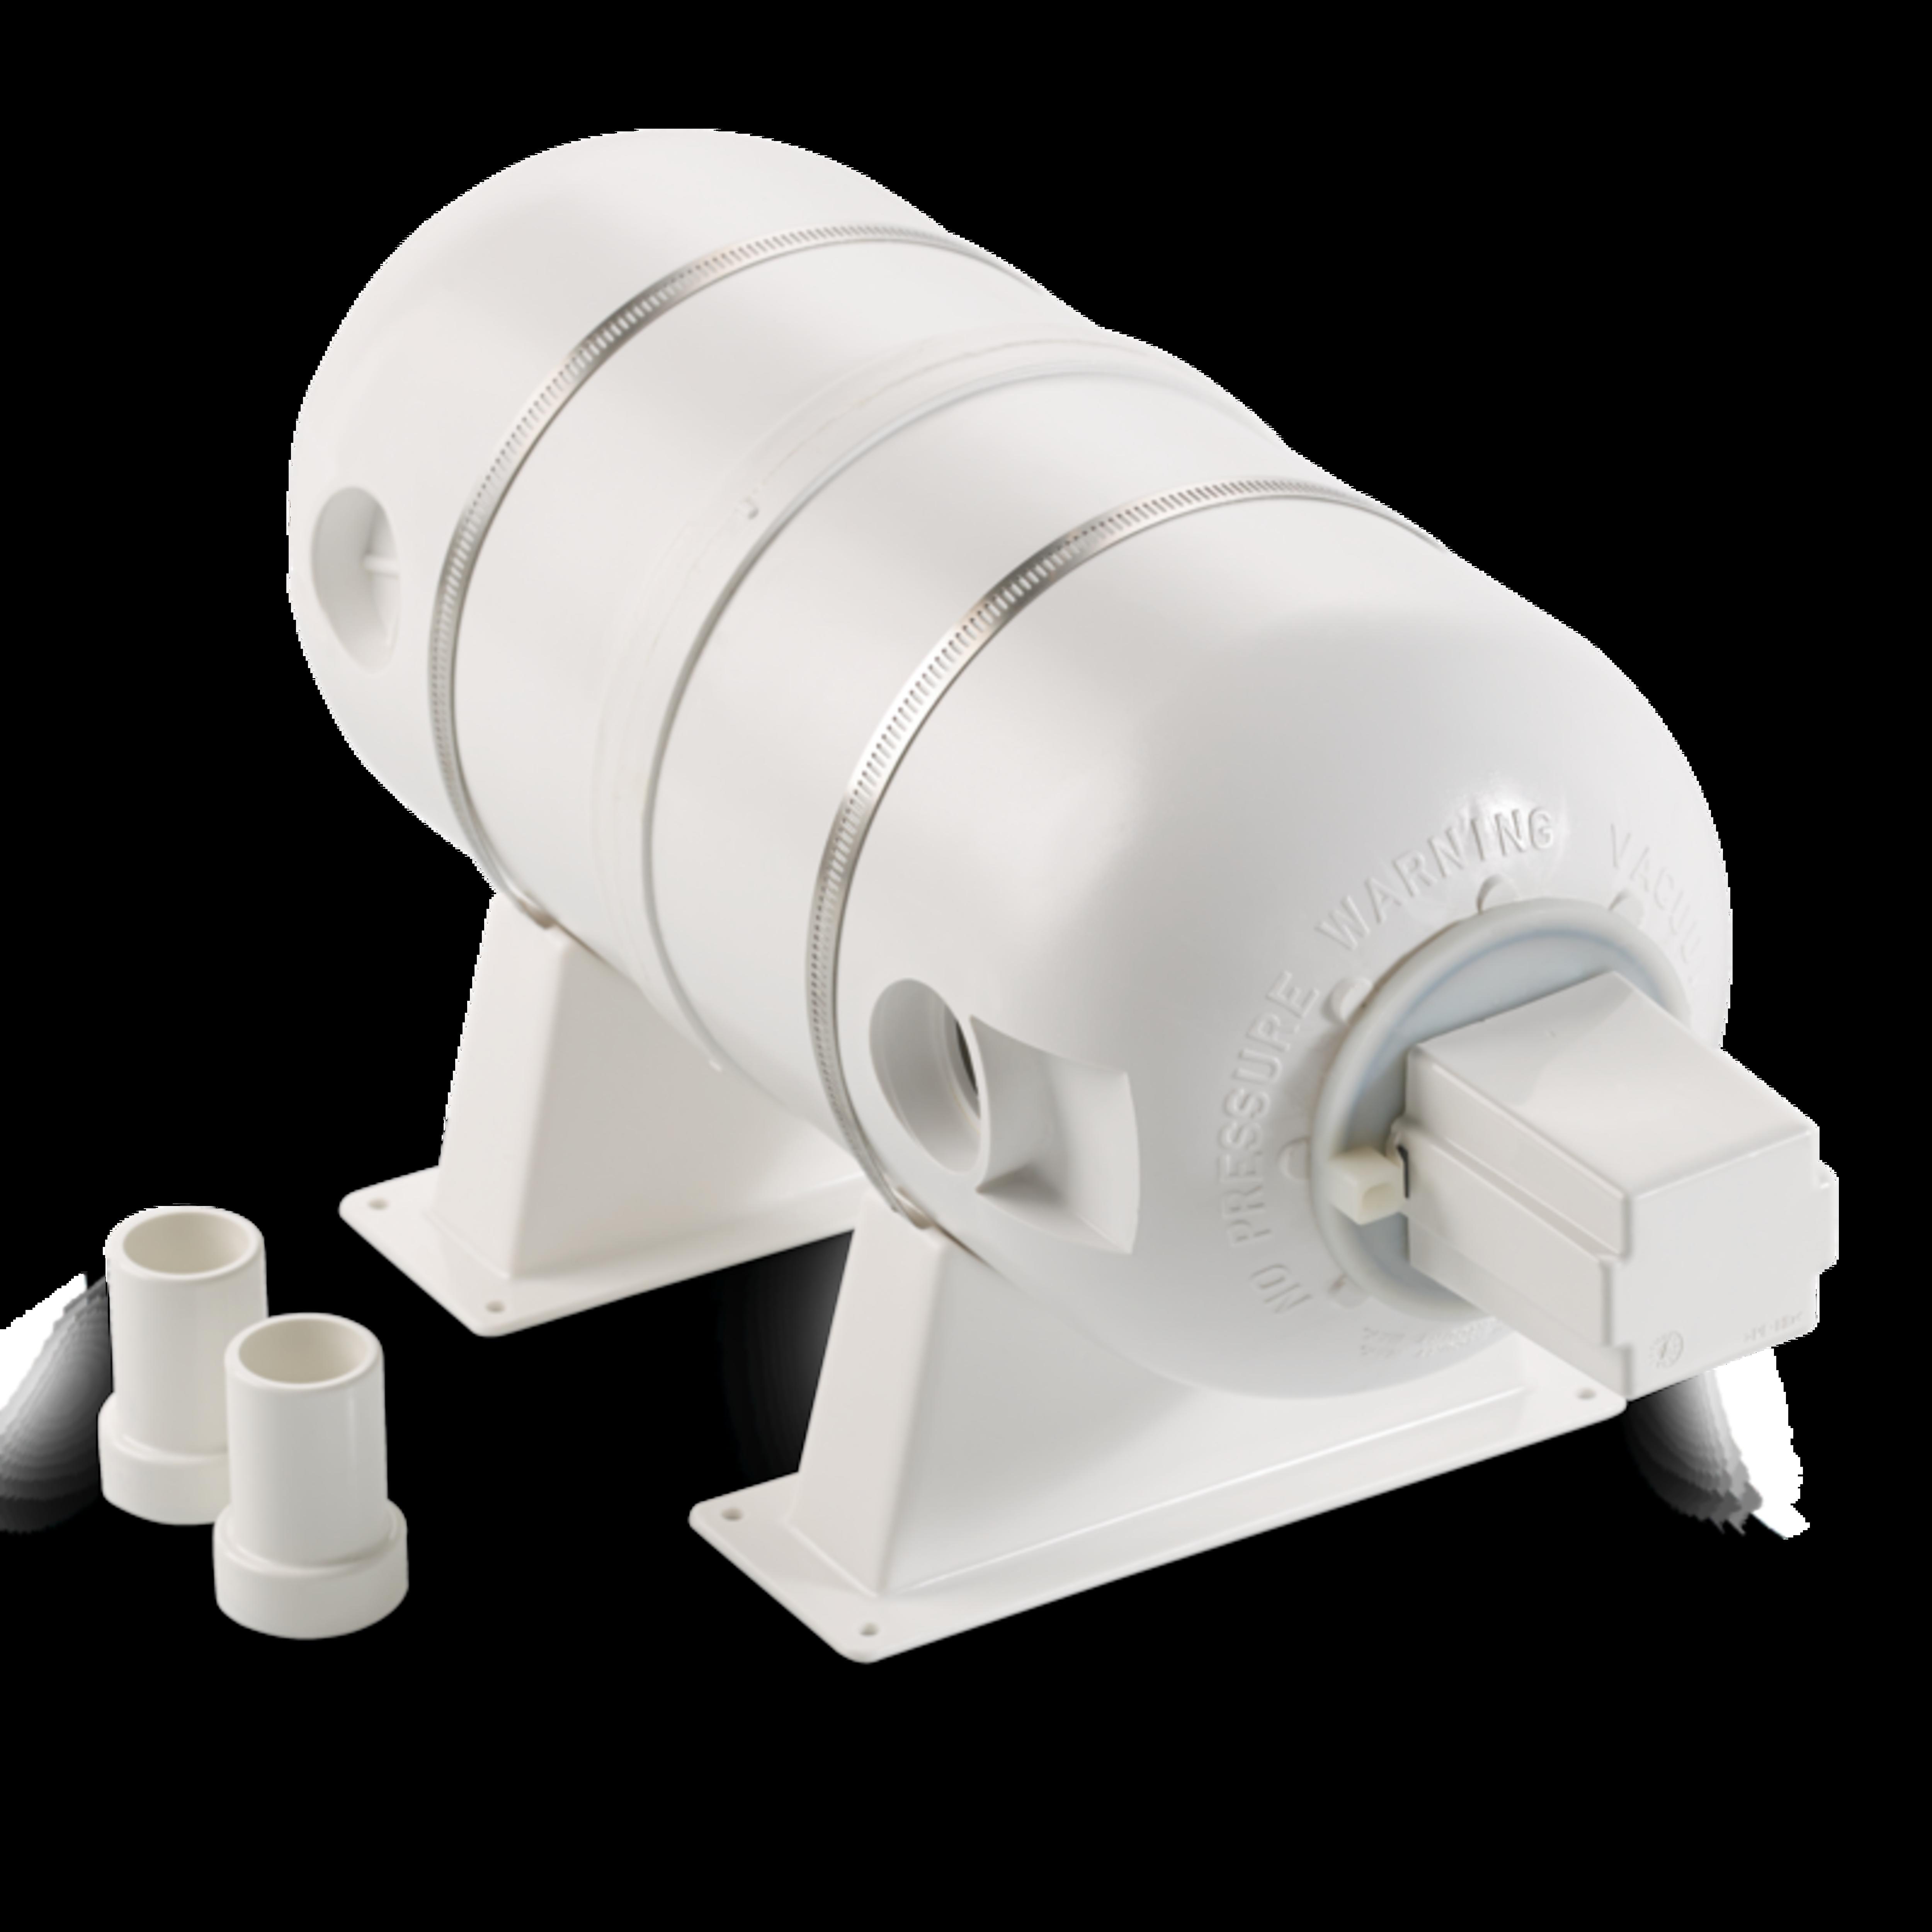 Dometic VT vacuum tank